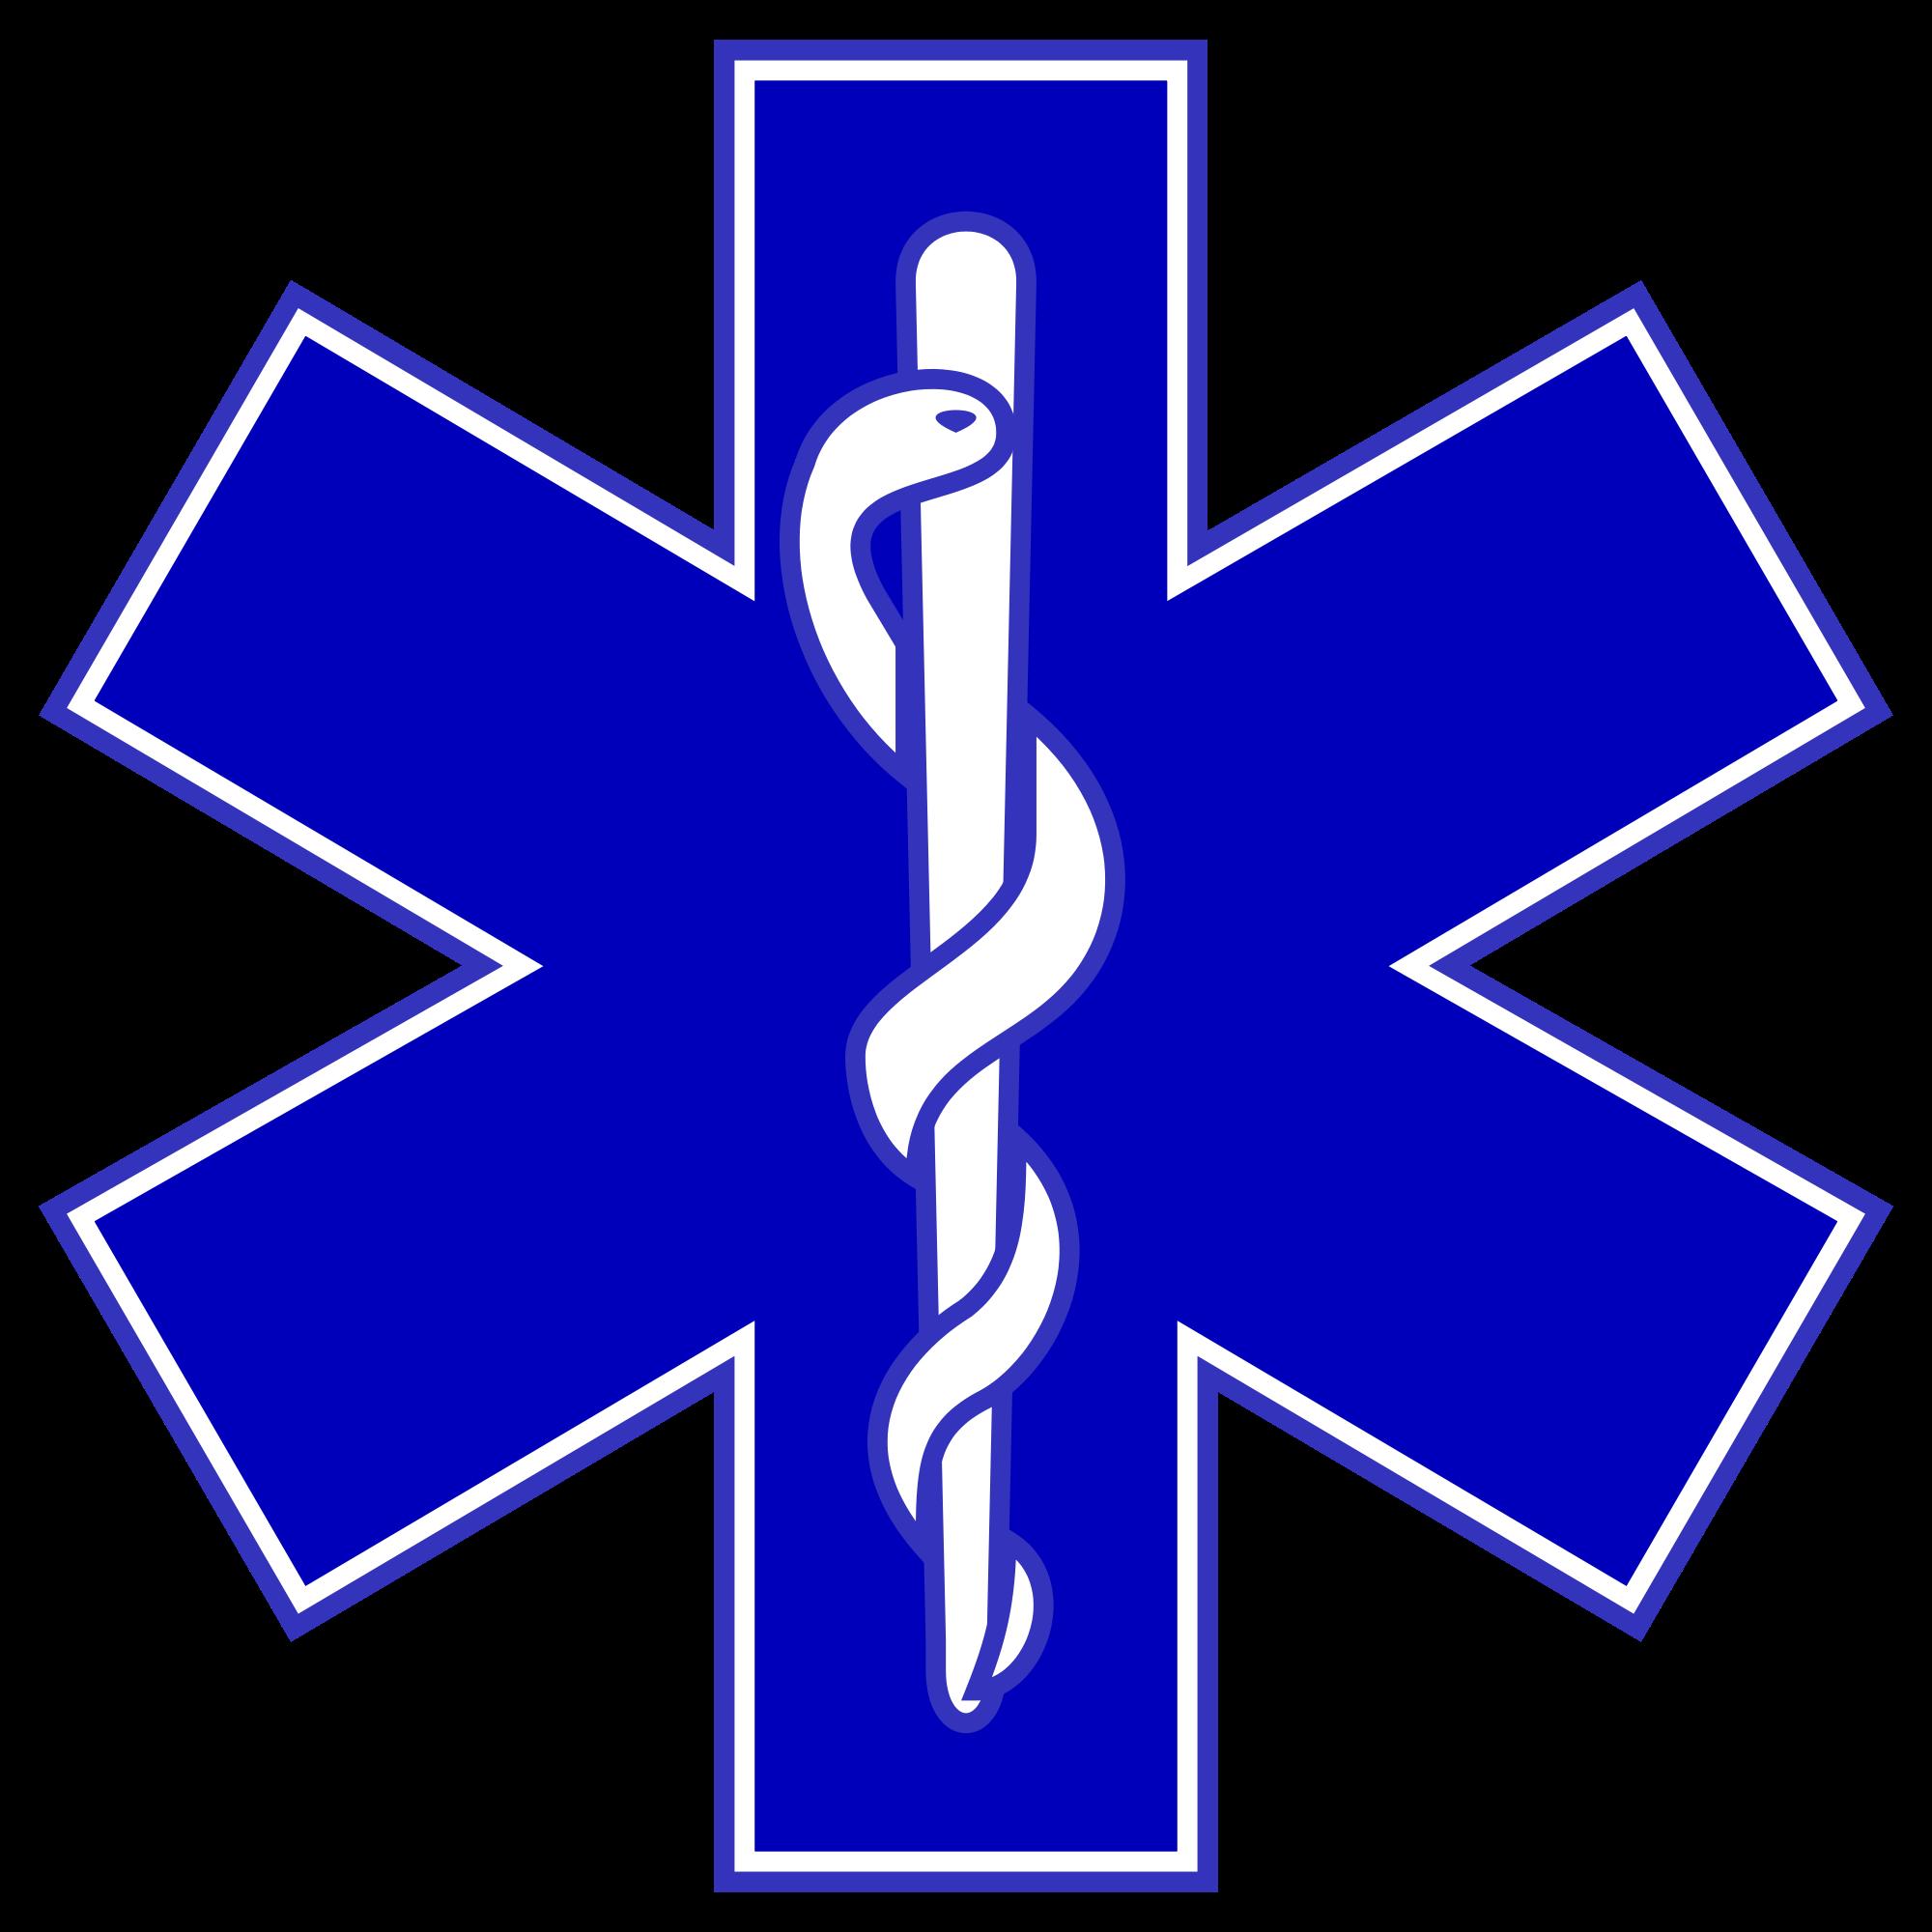 serpent symbolism wikipedia the free encyclopedia vinyl rh pinterest com Caduceus Symbol Meaning Caduceus Tattoo